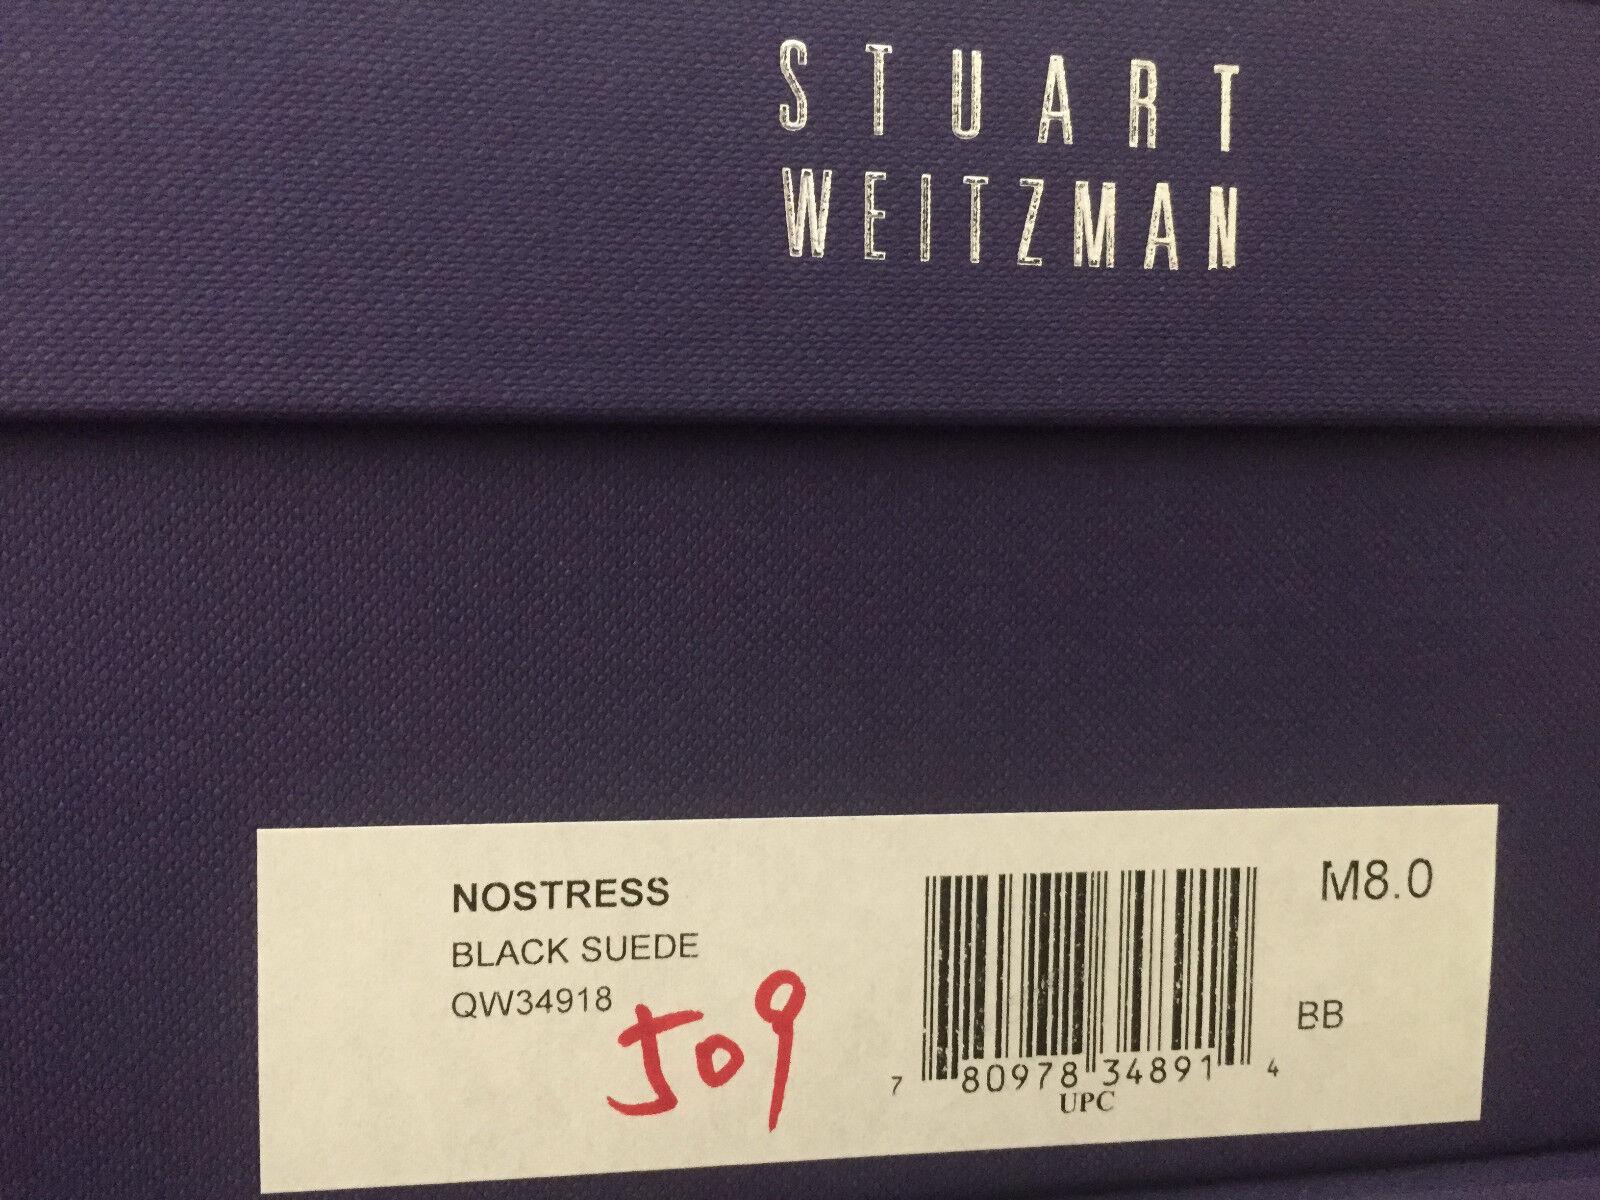 NIB Stuart Weitzman Nostress Nero Suede Stretch Stretch Stretch Ankle Boot 7 7.5 8 b0e0ac